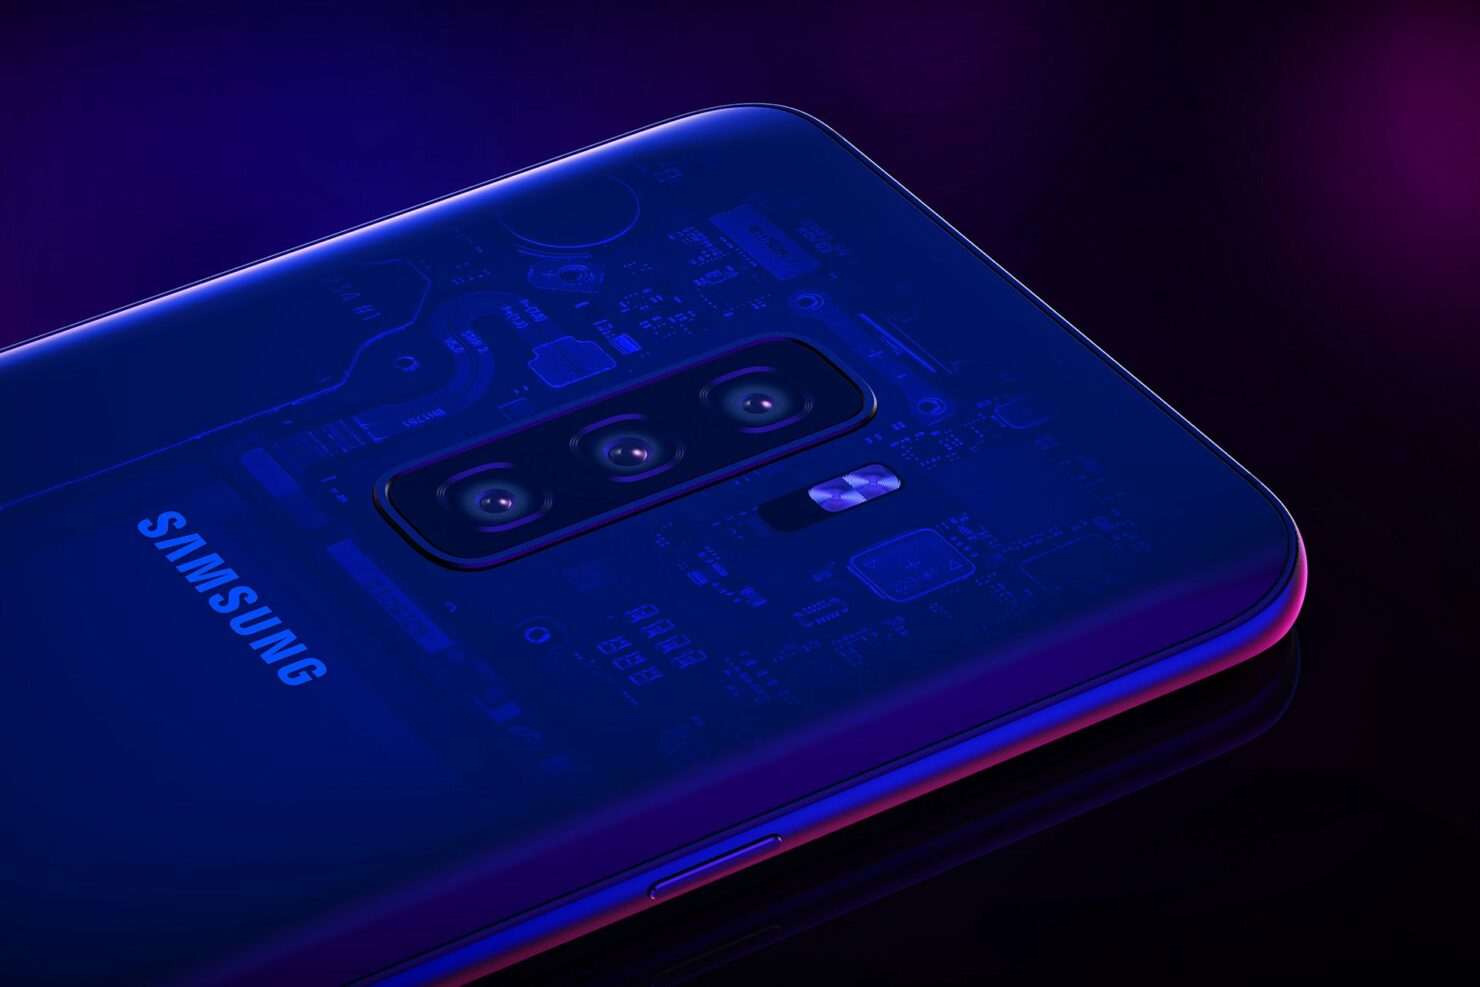 Samsung quadruple camera smartphone 2018 launch